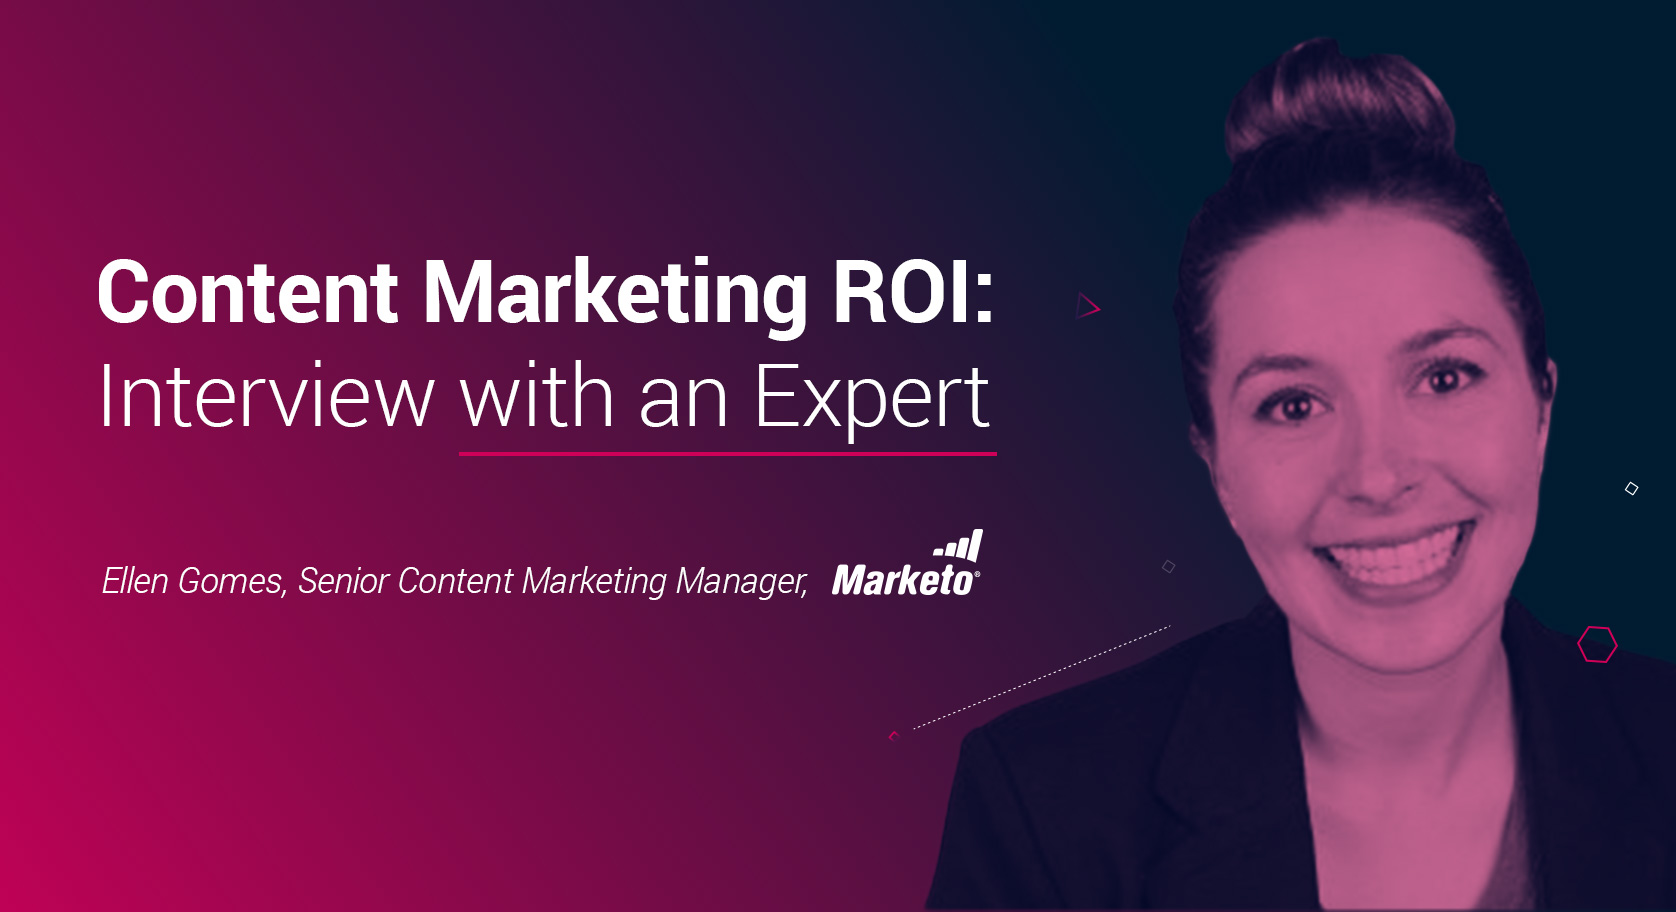 Content Marketing ROI Interview | Uberflip